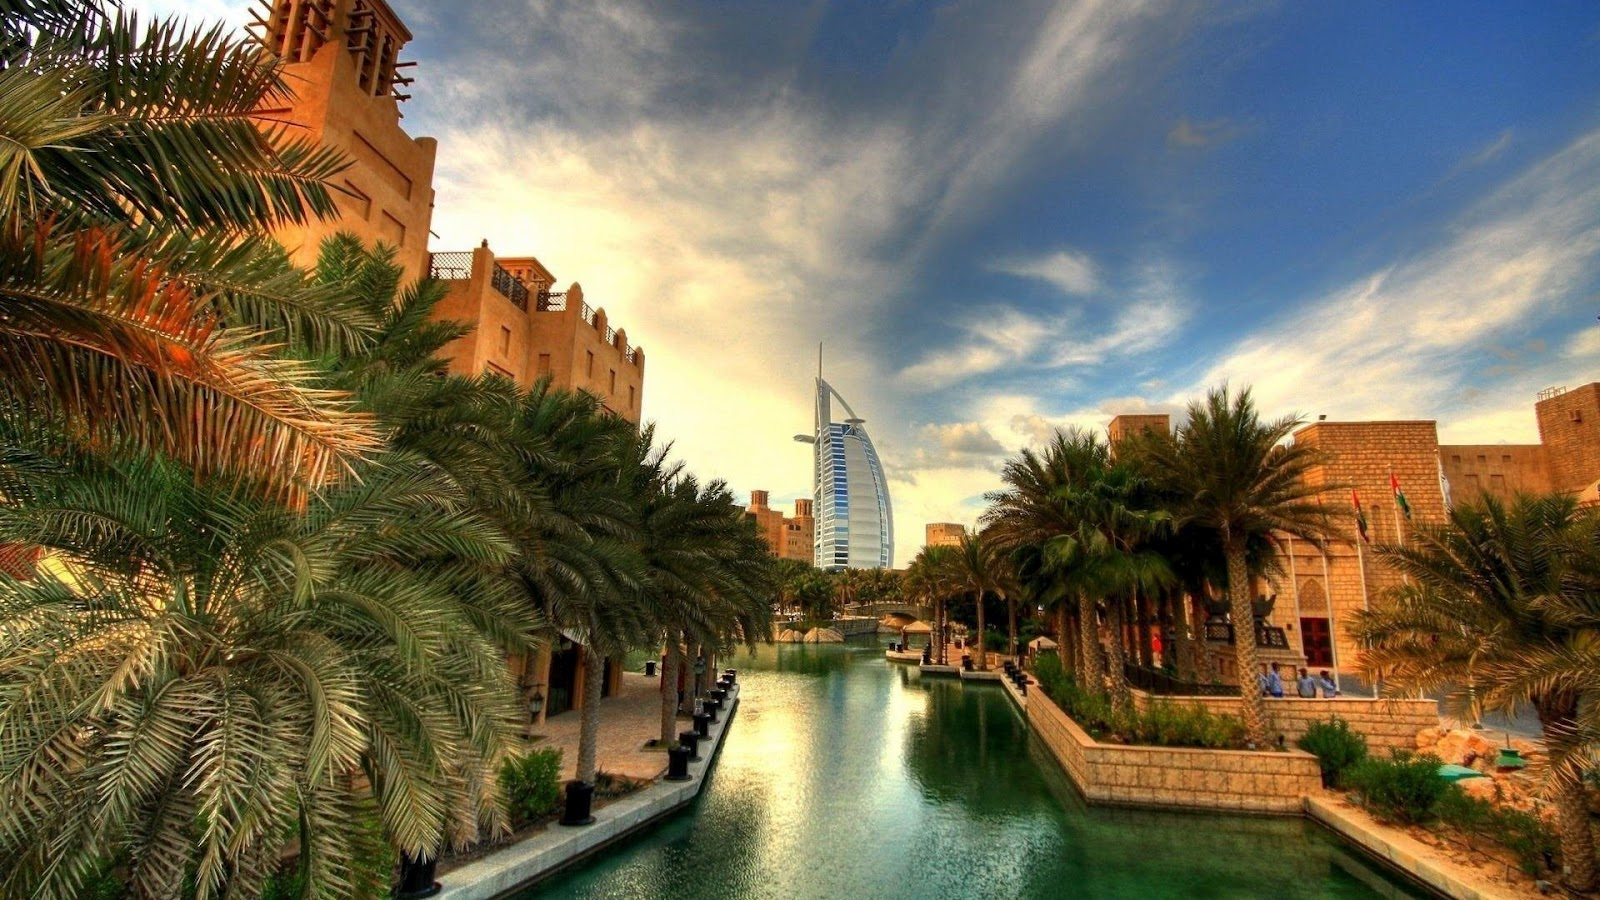 Dubai Architecture | Full HD Desktop Wallpapers 1080p